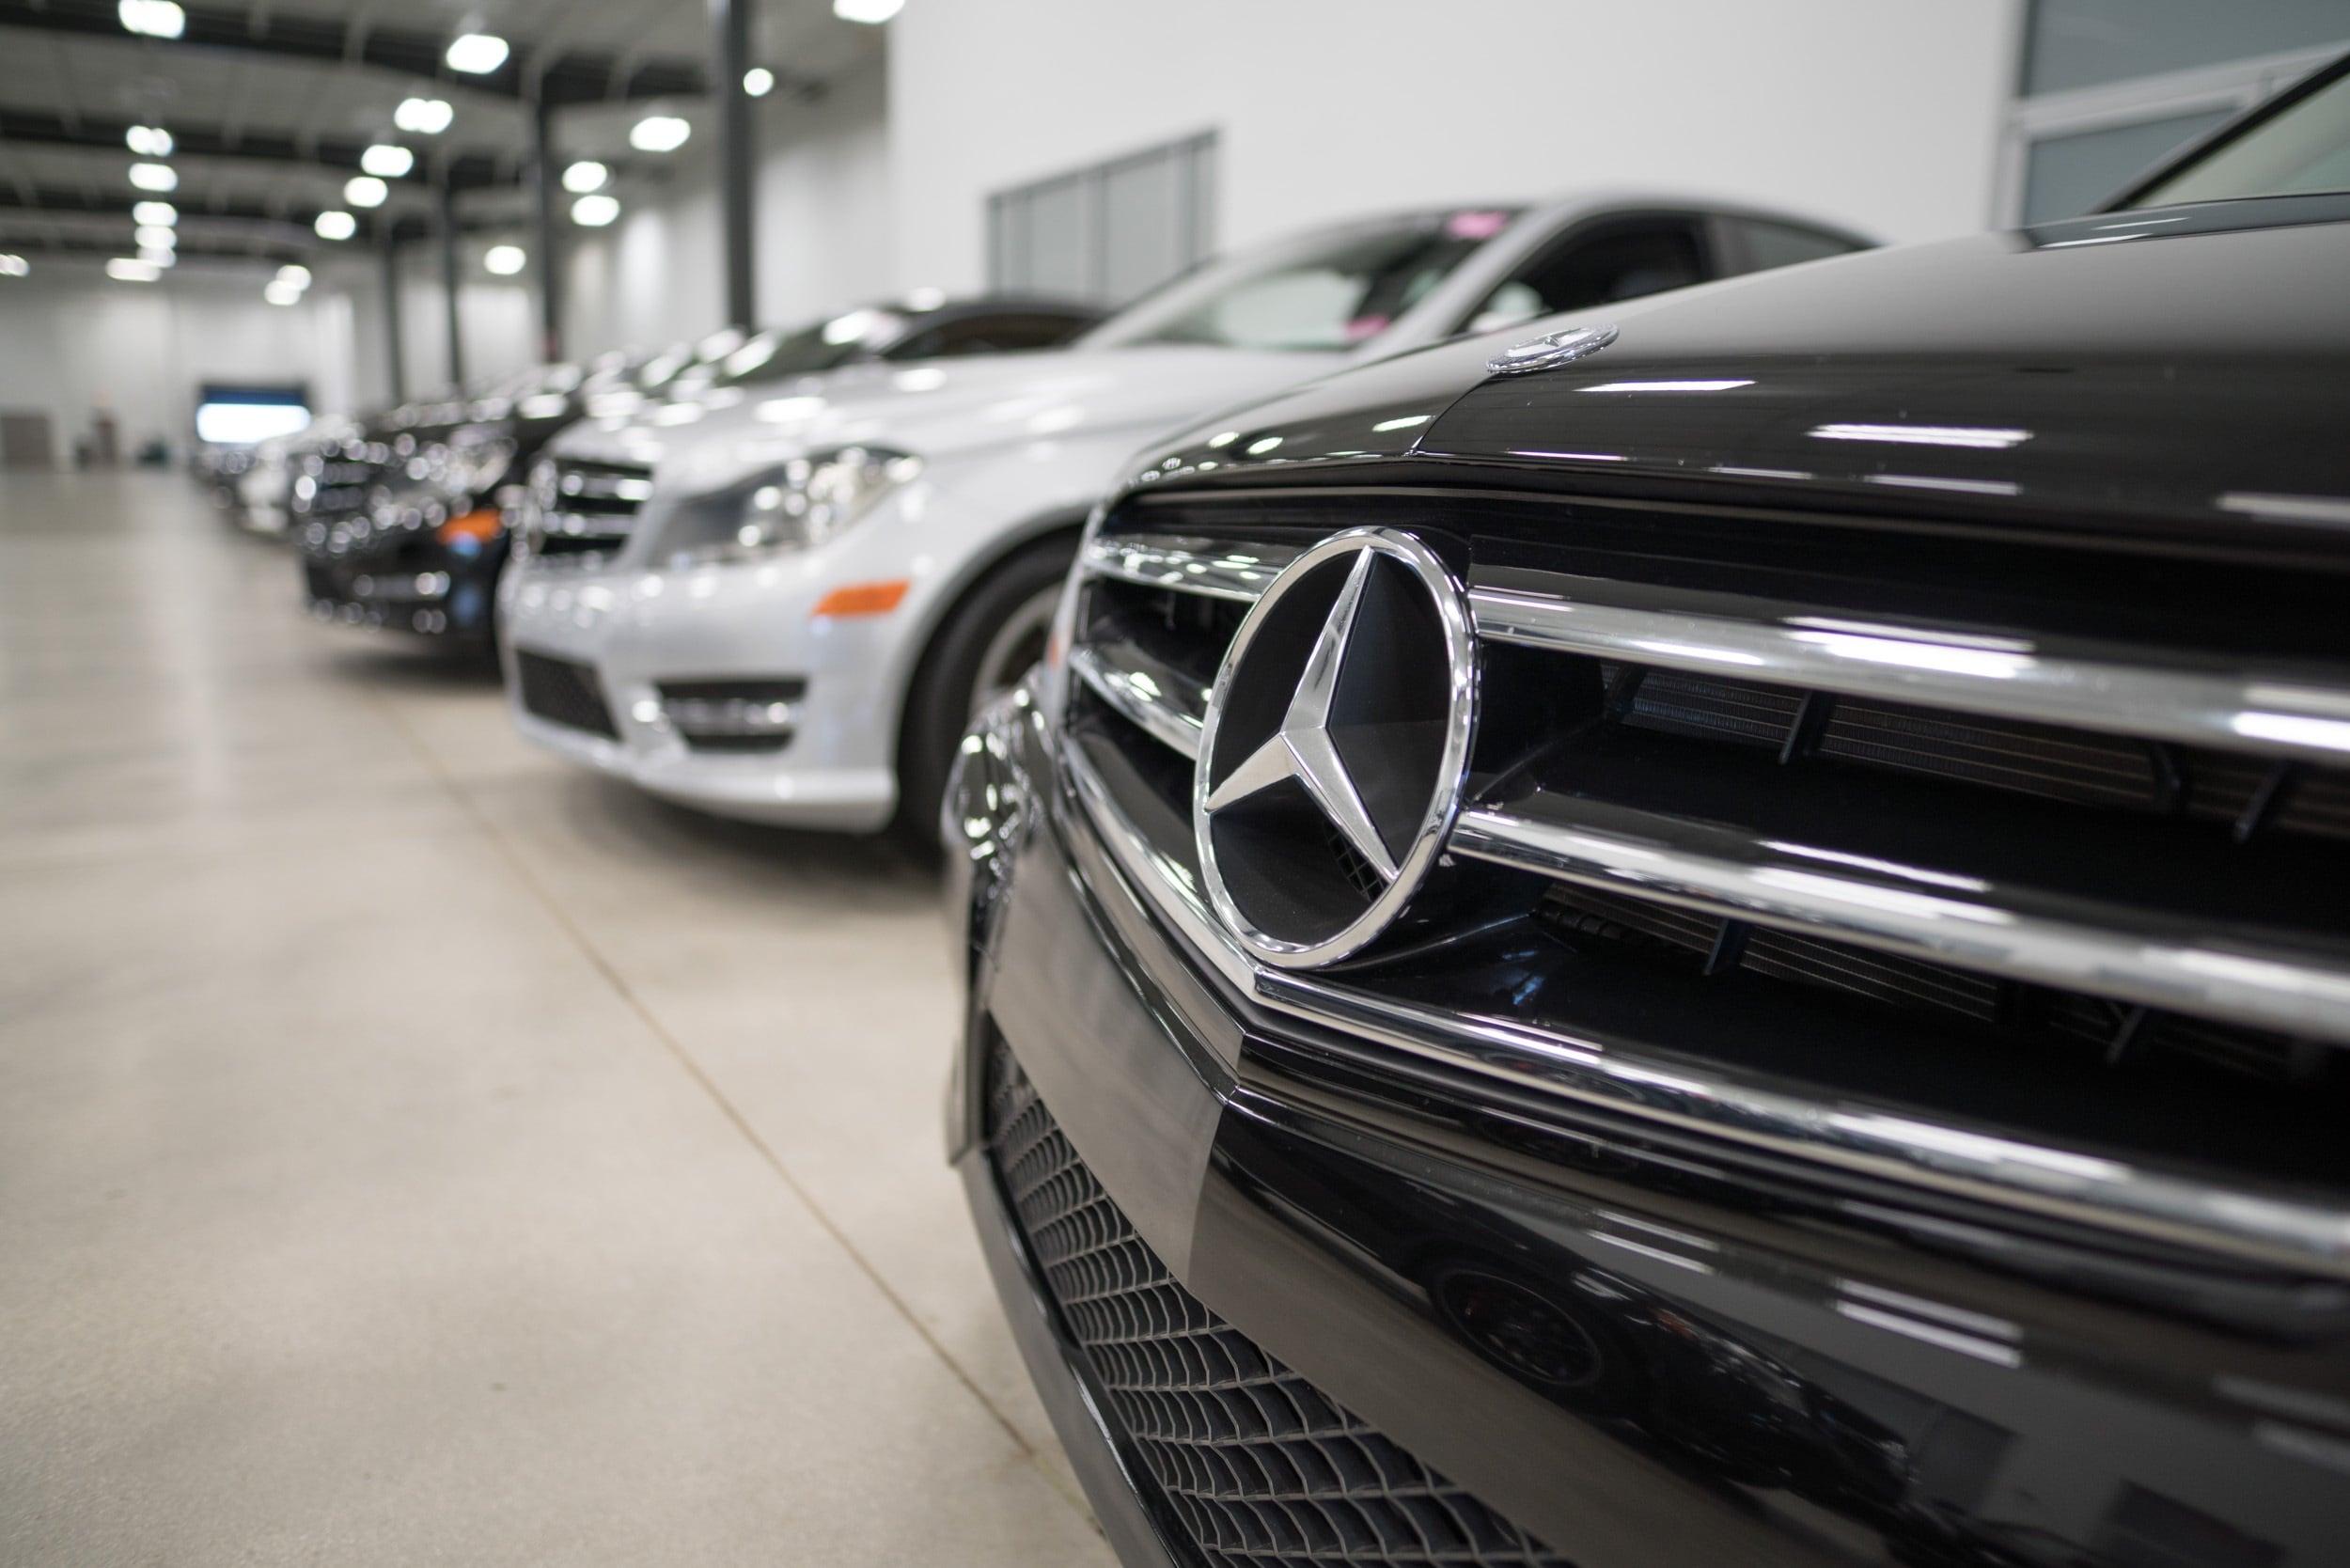 Mercedes benz dealer near me sarasota fl mercedes benz for Mercedes benz of sarasota inventory